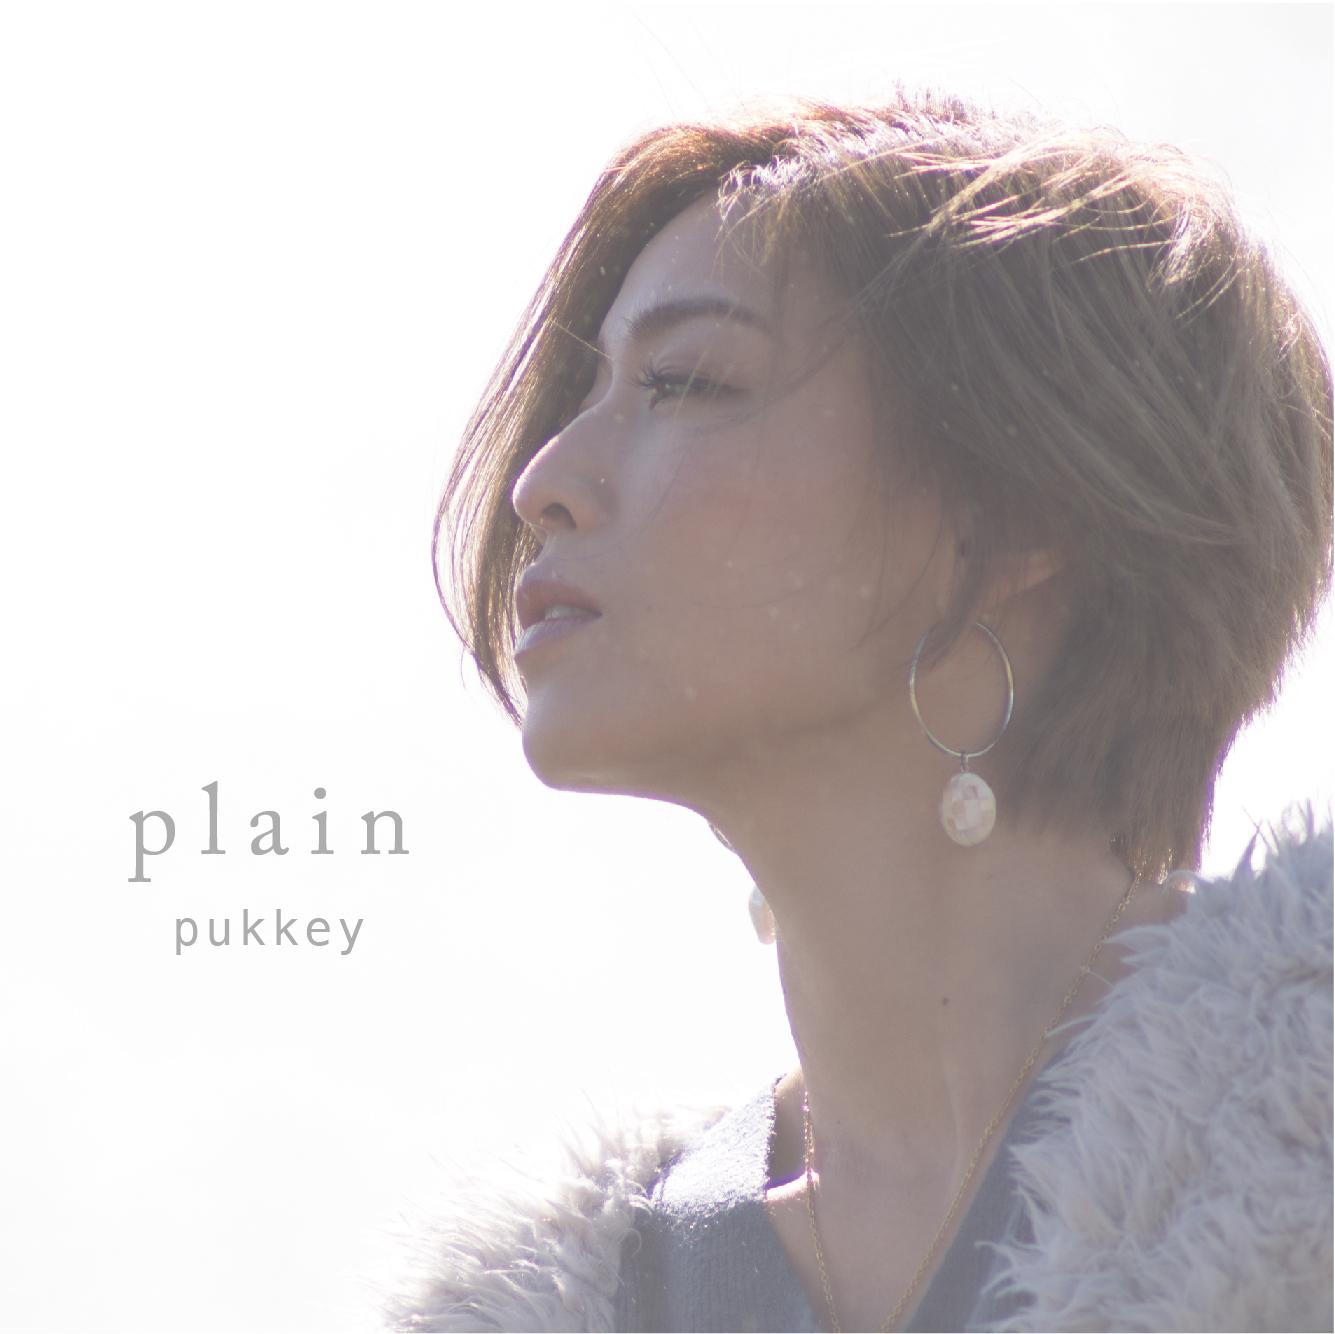 plain / pukkey 初回限定盤 ※未発表曲プレゼンント※